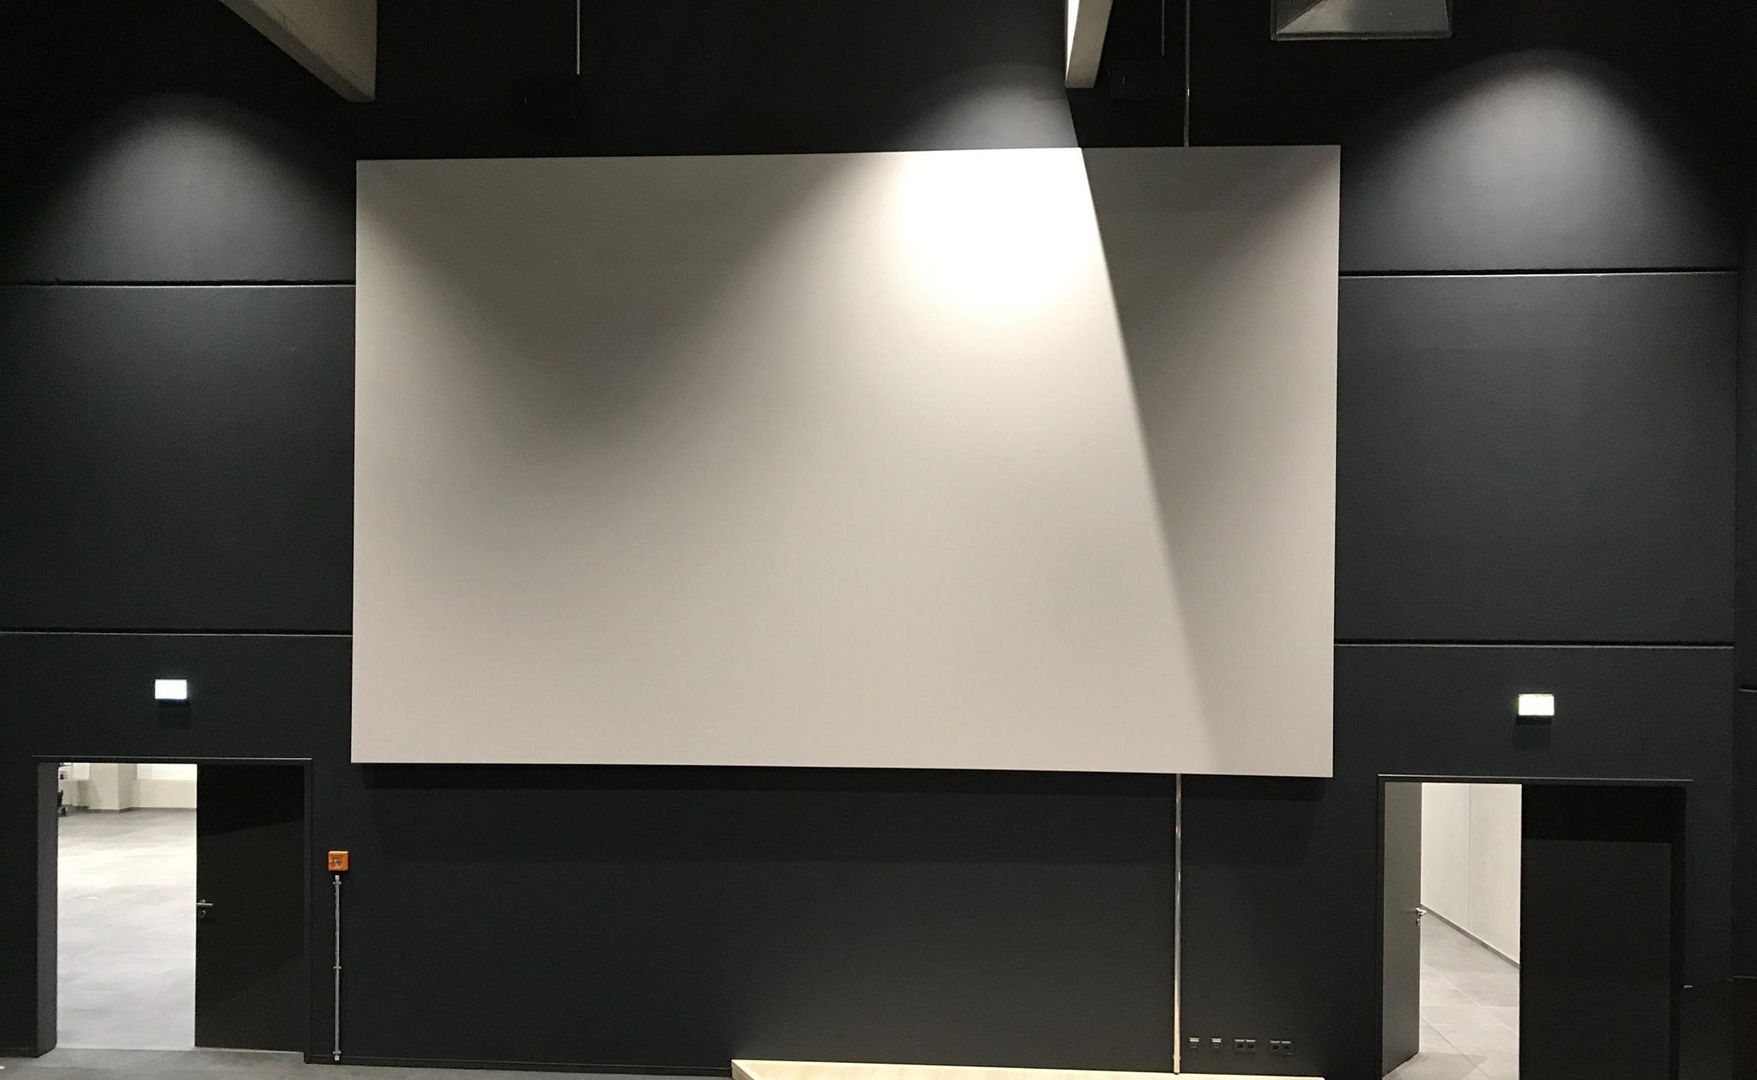 Unternehmens-Kino Leinwand